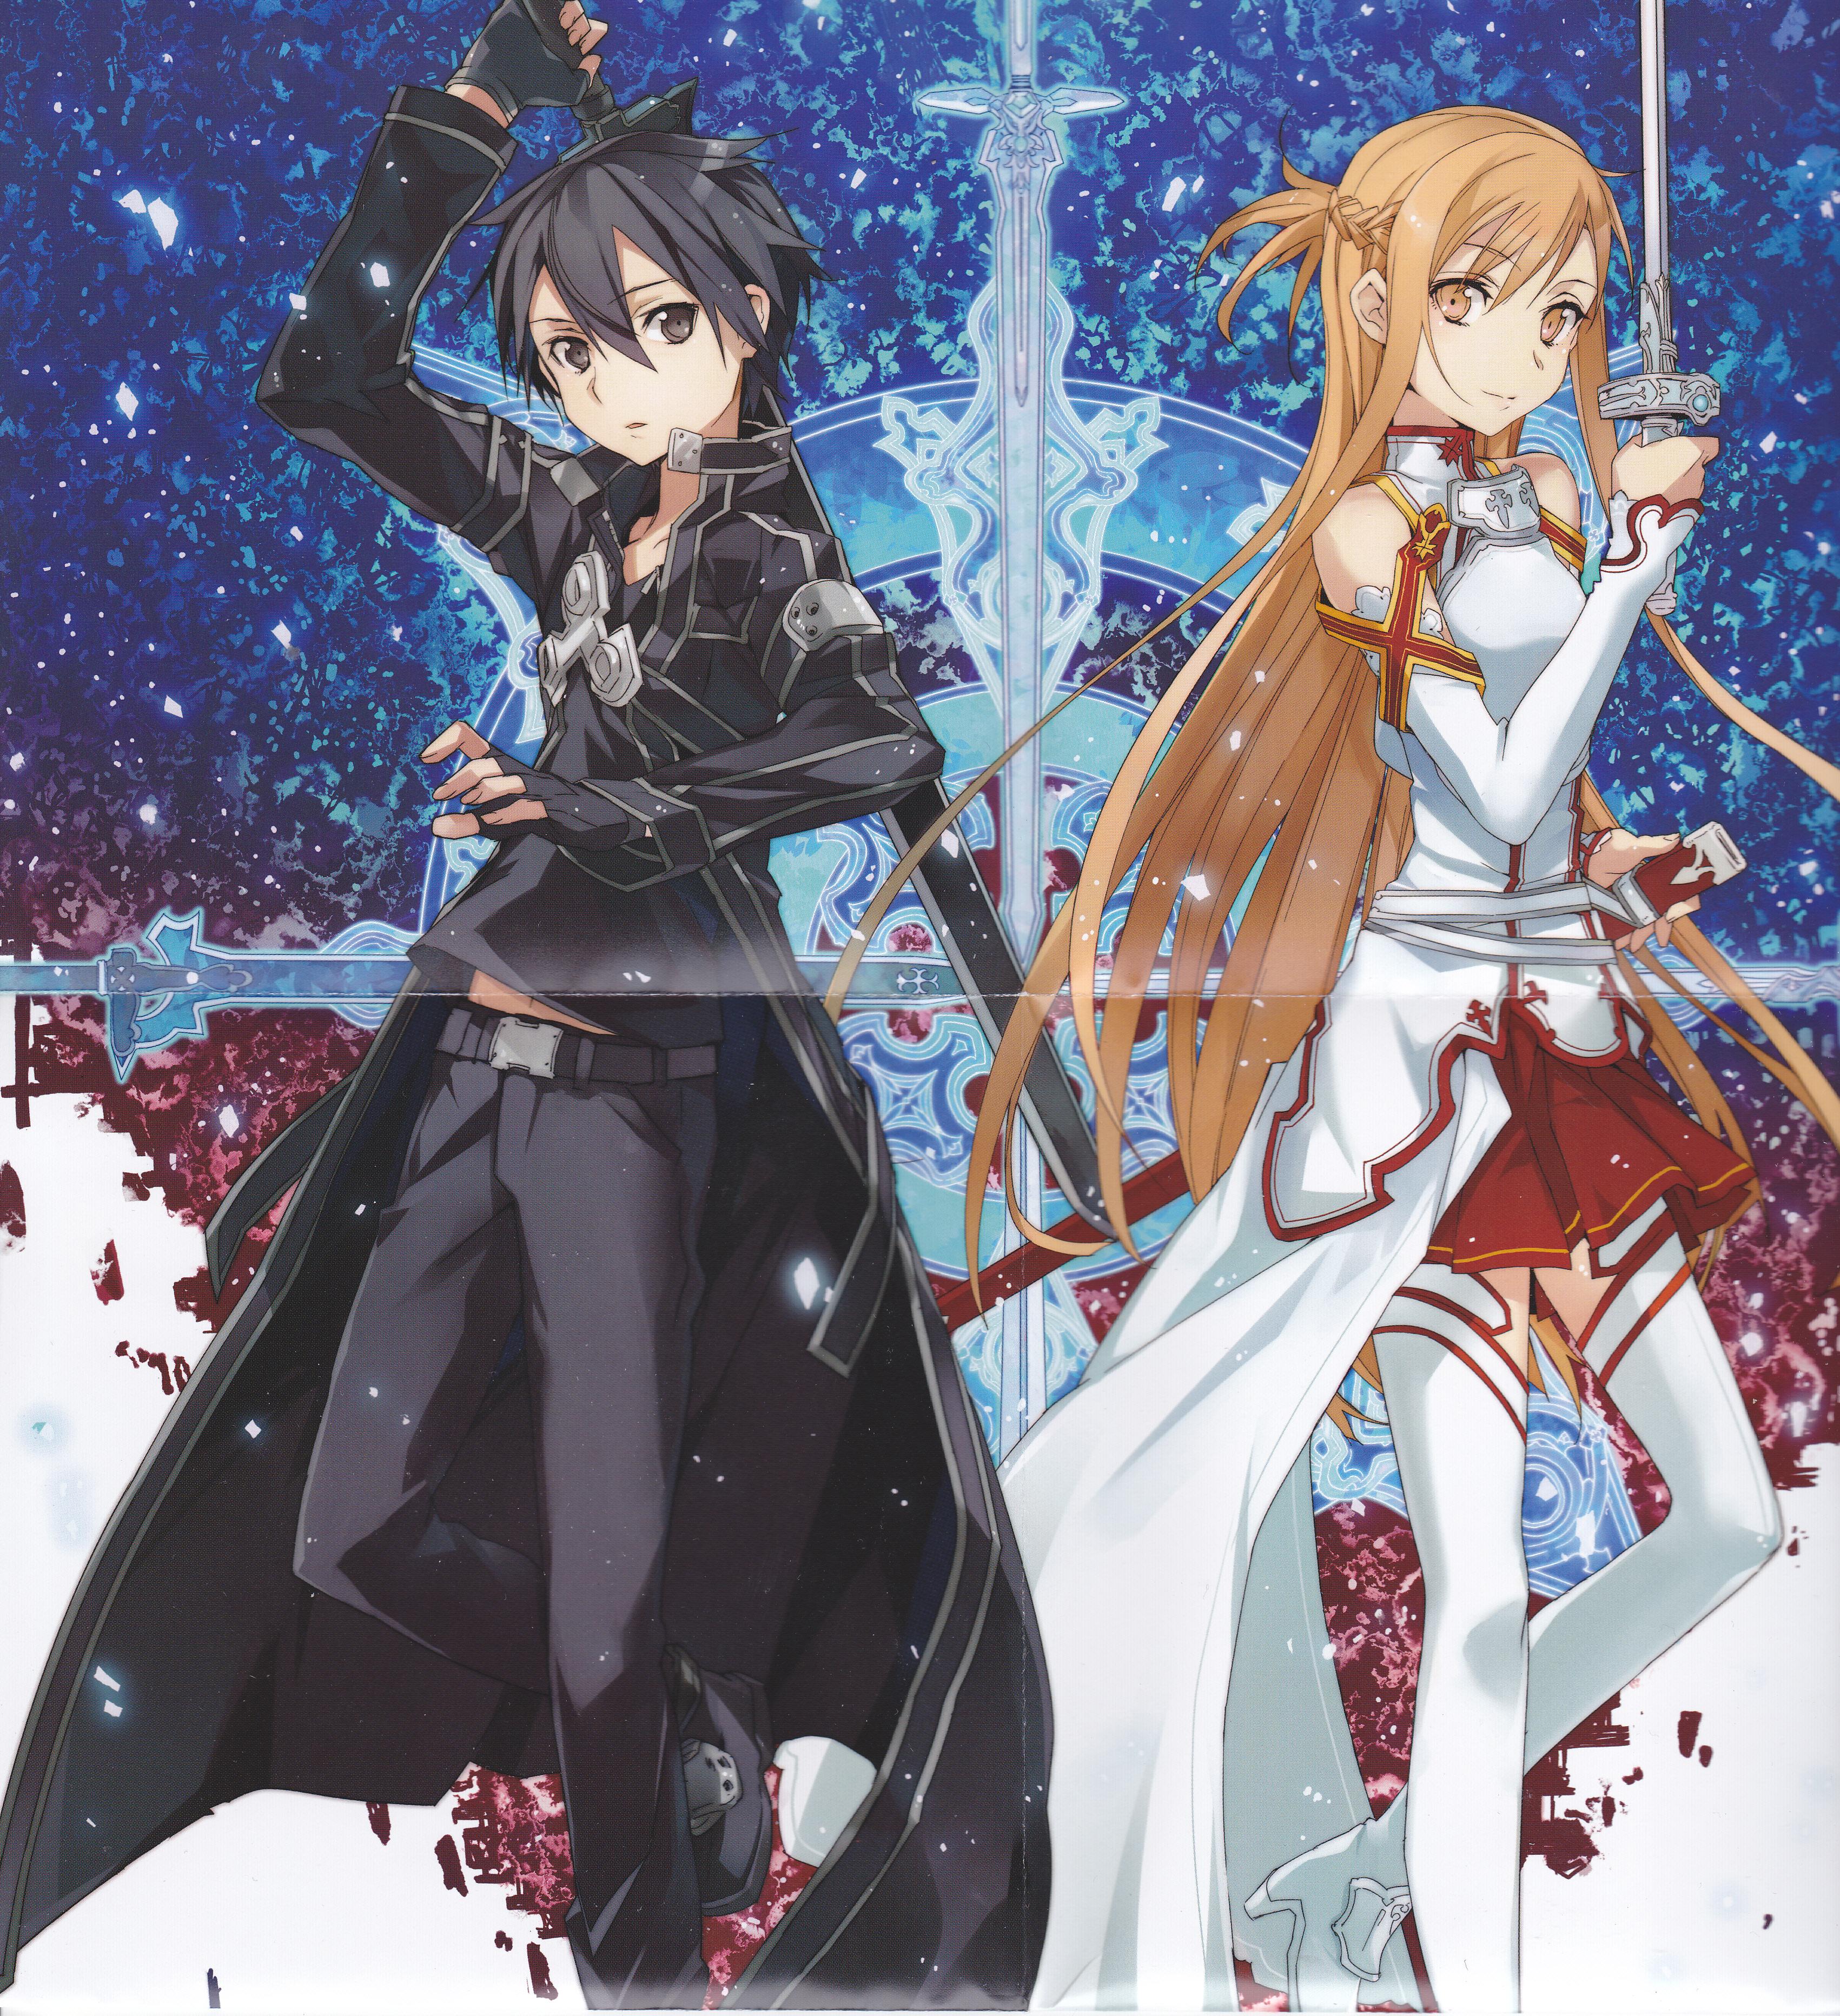 Sword art online full 1216872 sword 20art 20online 20200x100